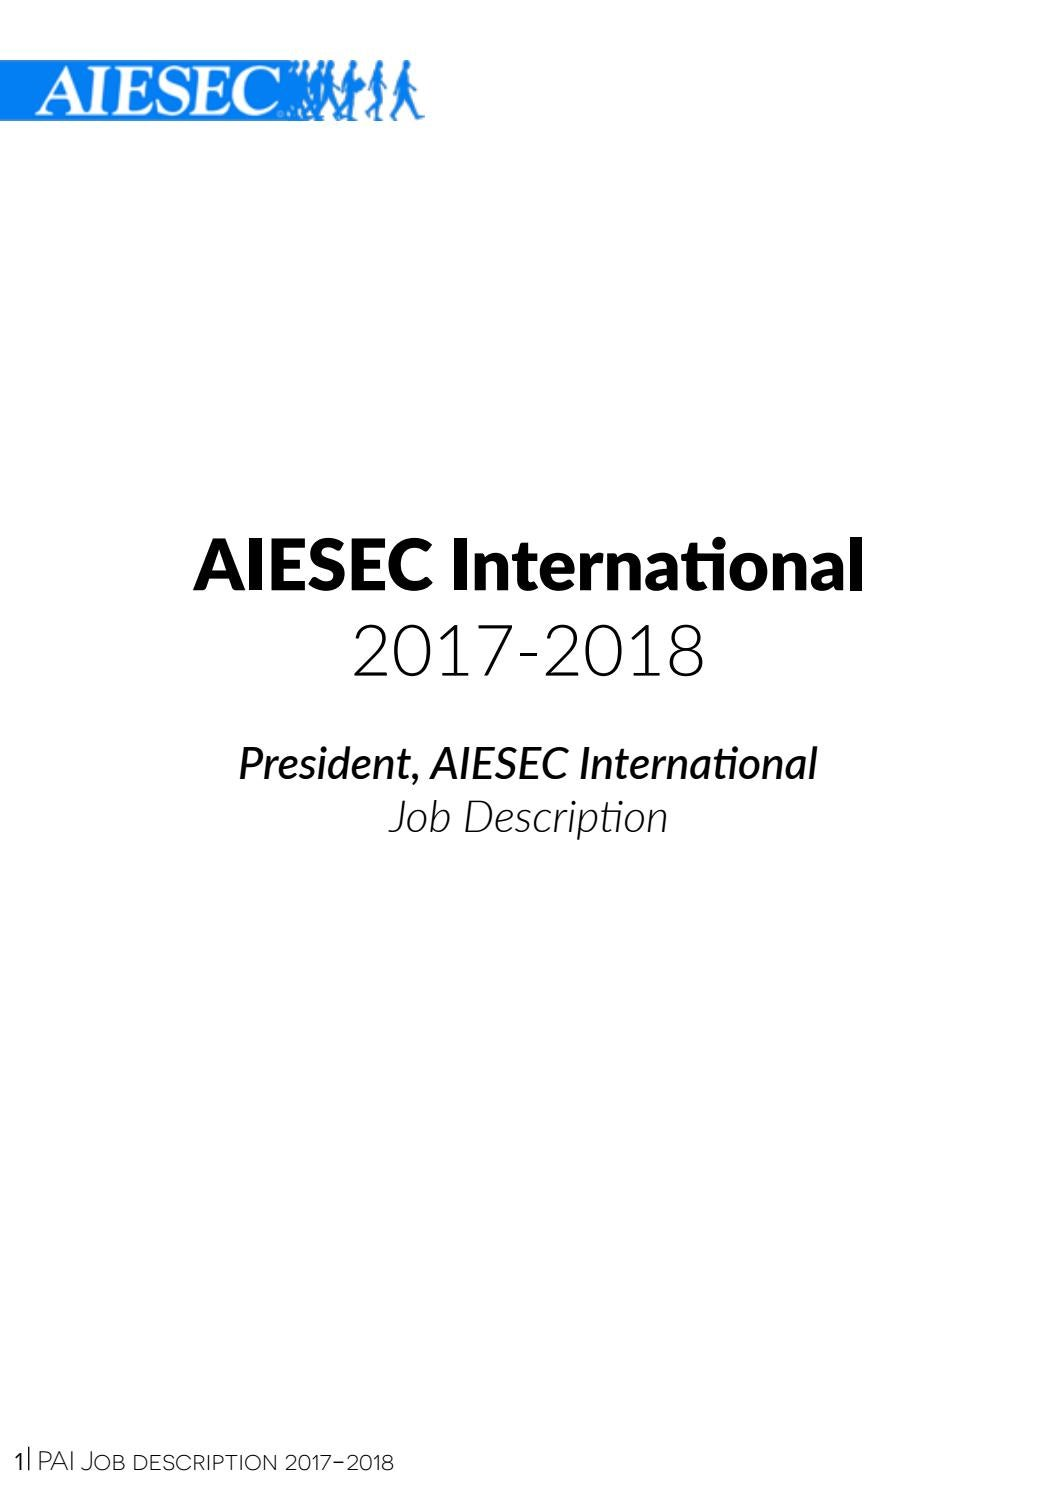 PAI Job Description 1718 by AIESEC International issuu – President Job Description